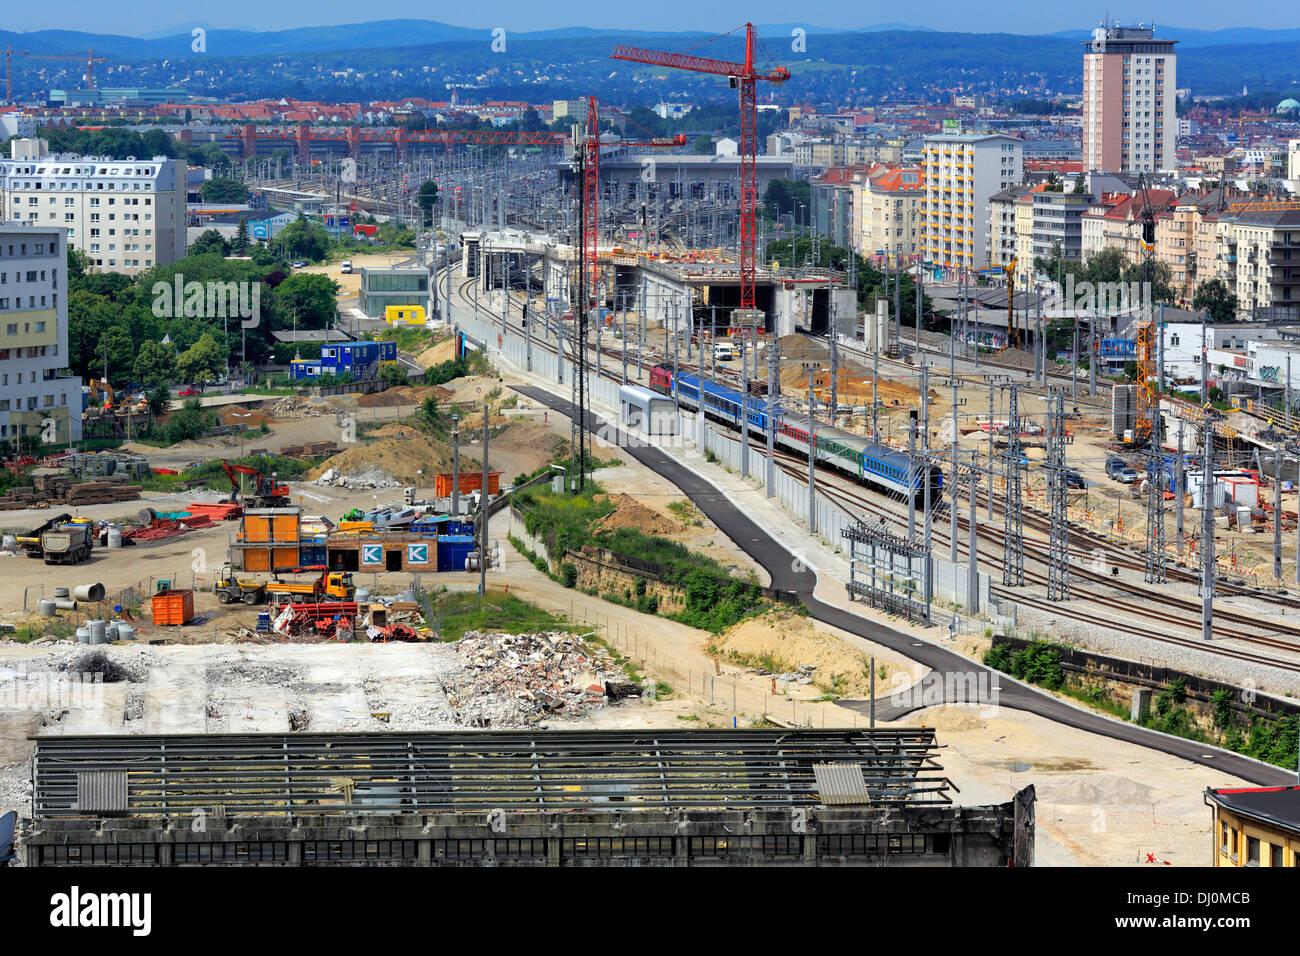 Construction of Wien Hauptbahnhof (Central train station), Vienna, Austria - Stock Image